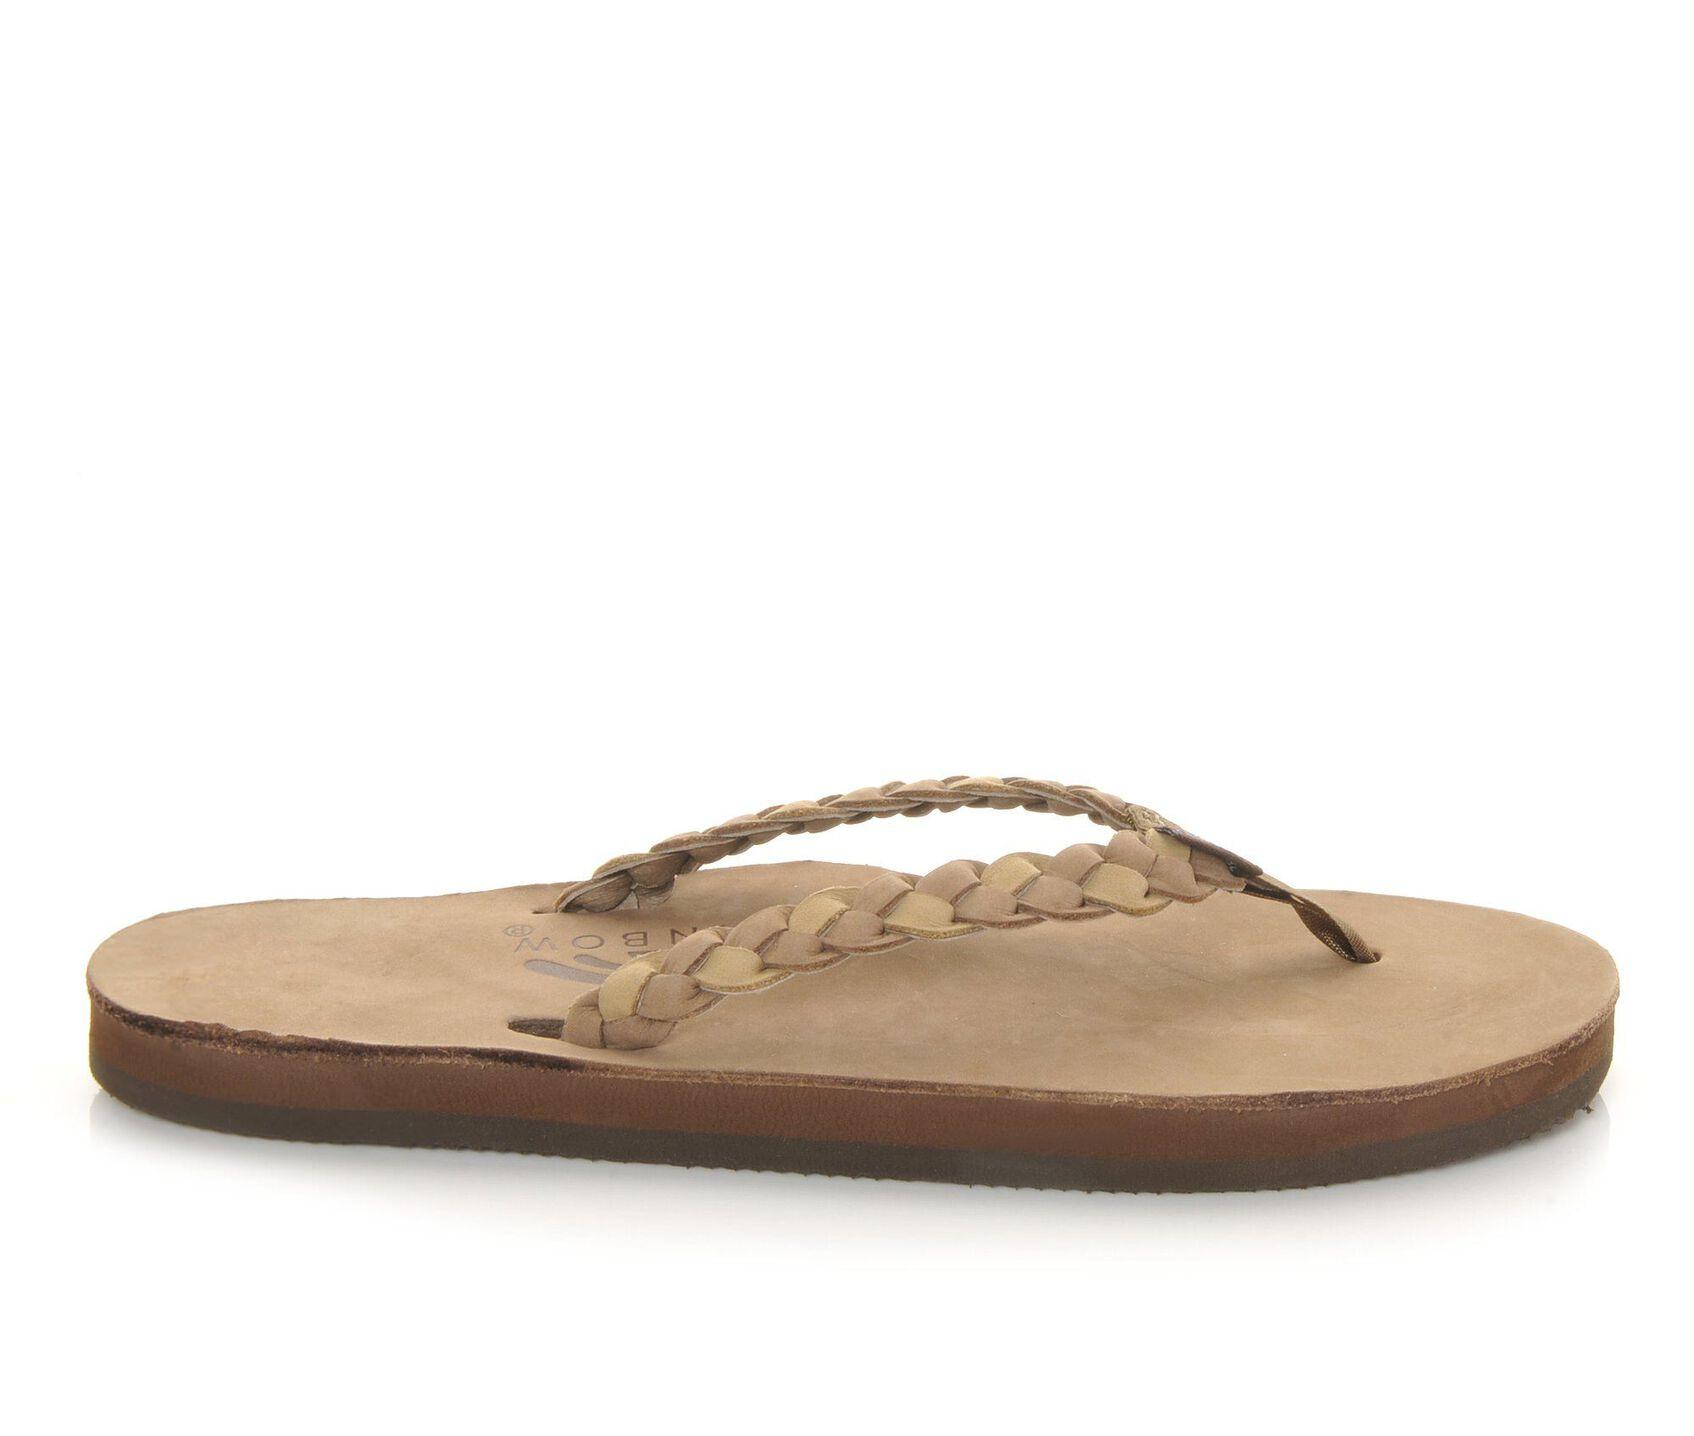 93defb993c9 Women's Rainbow Sandals Twisted Sister Flip-Flops